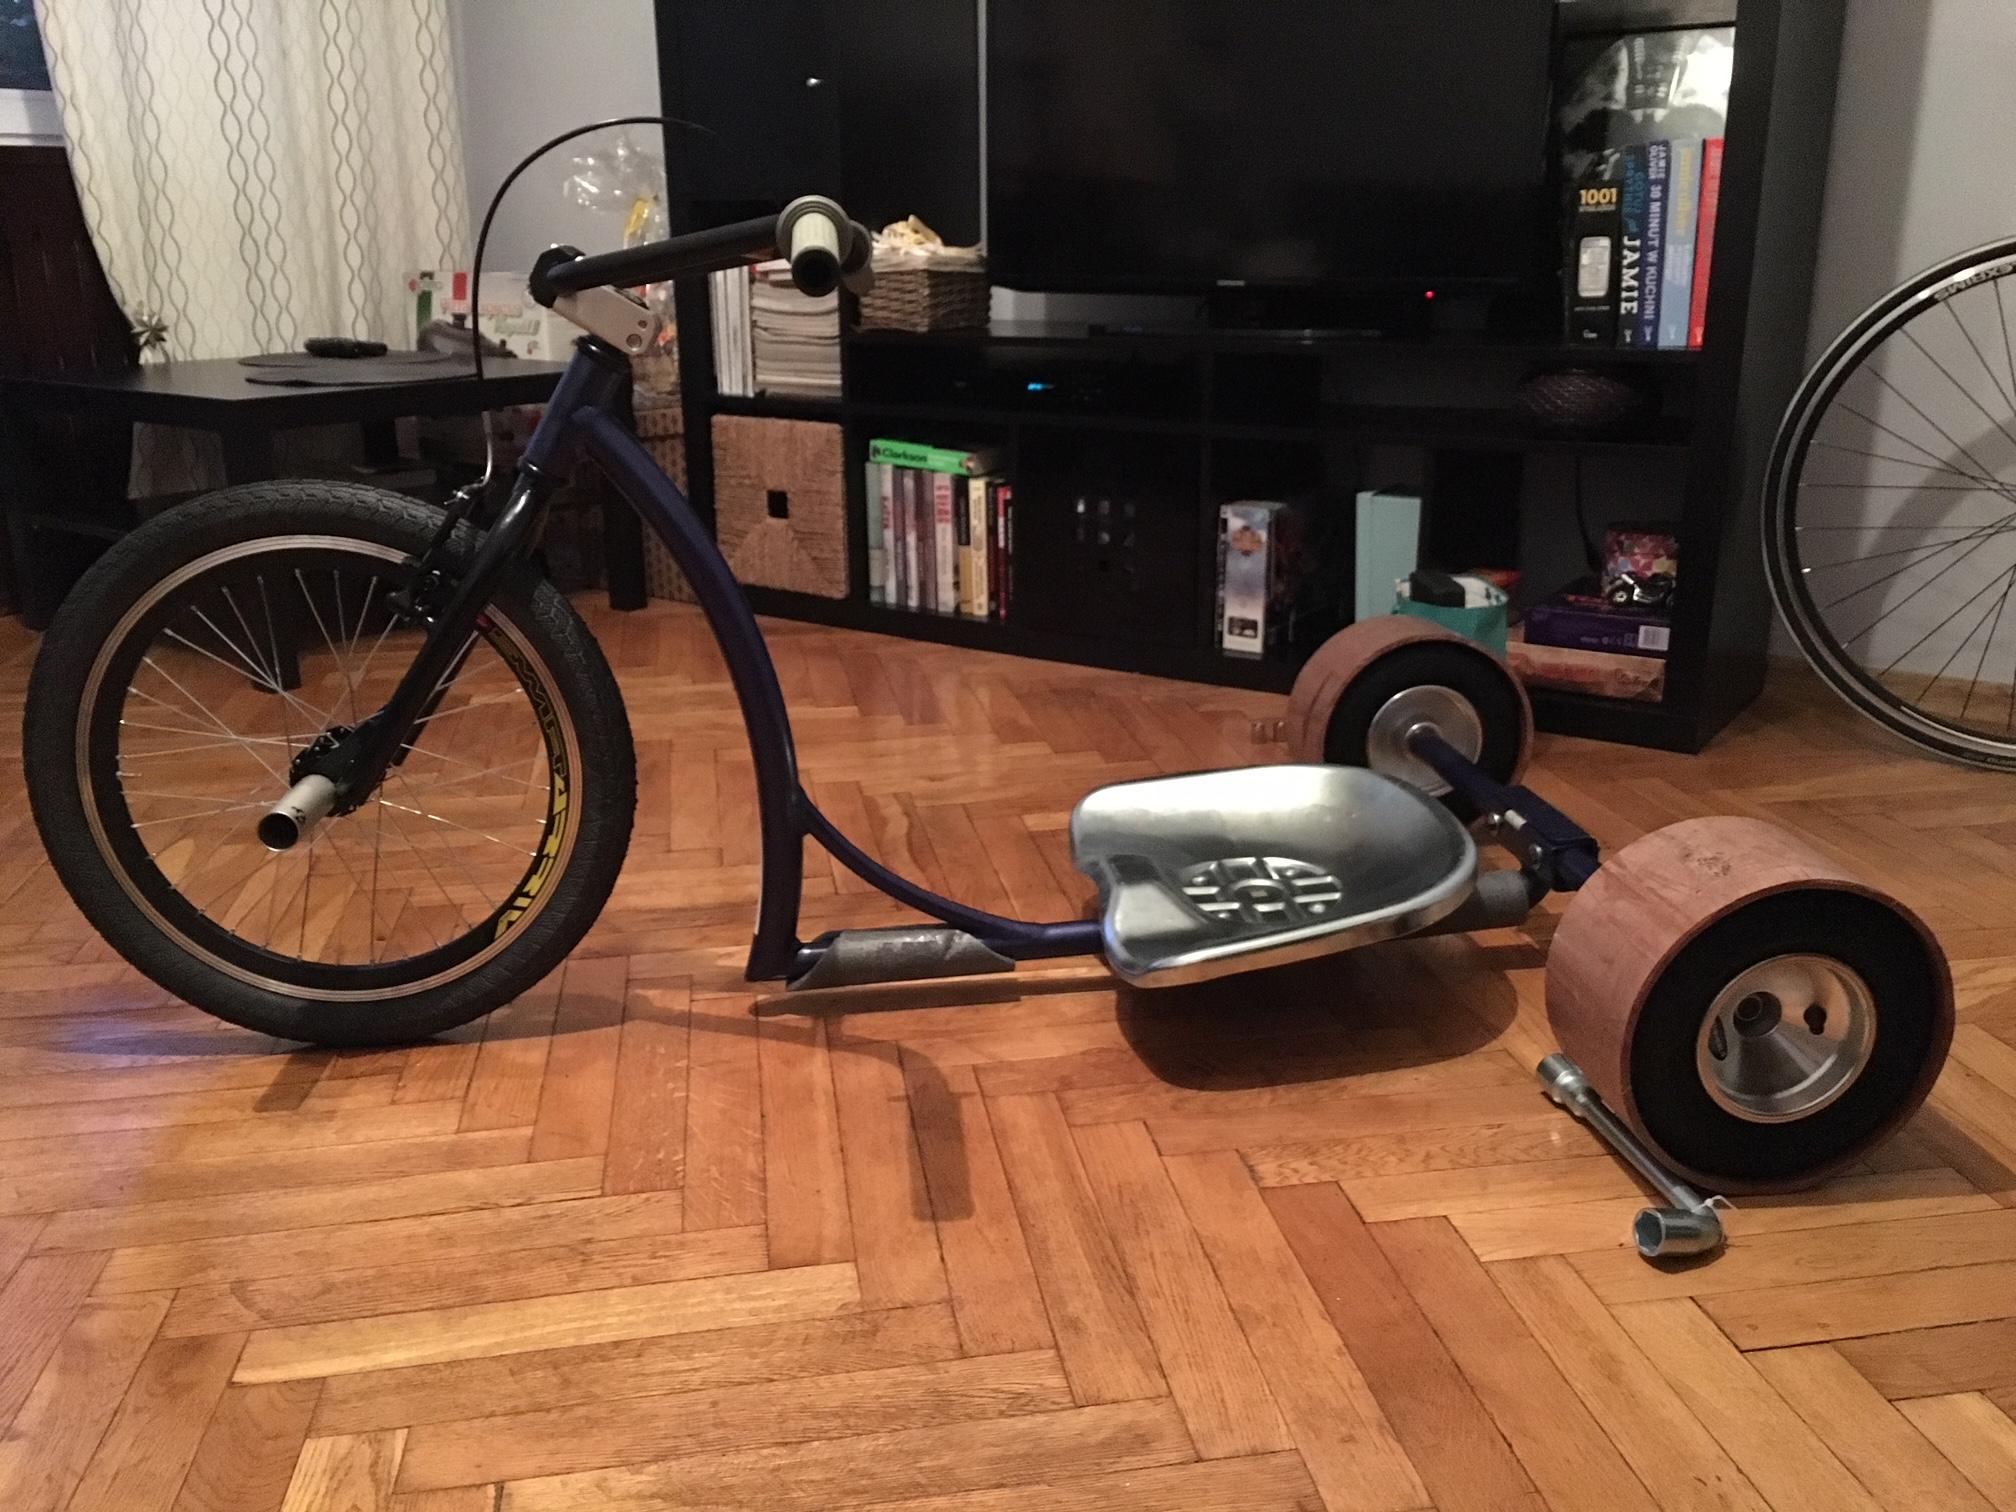 Drift Trike Trajka Dizzy Star Okazja Ideał 7116769024